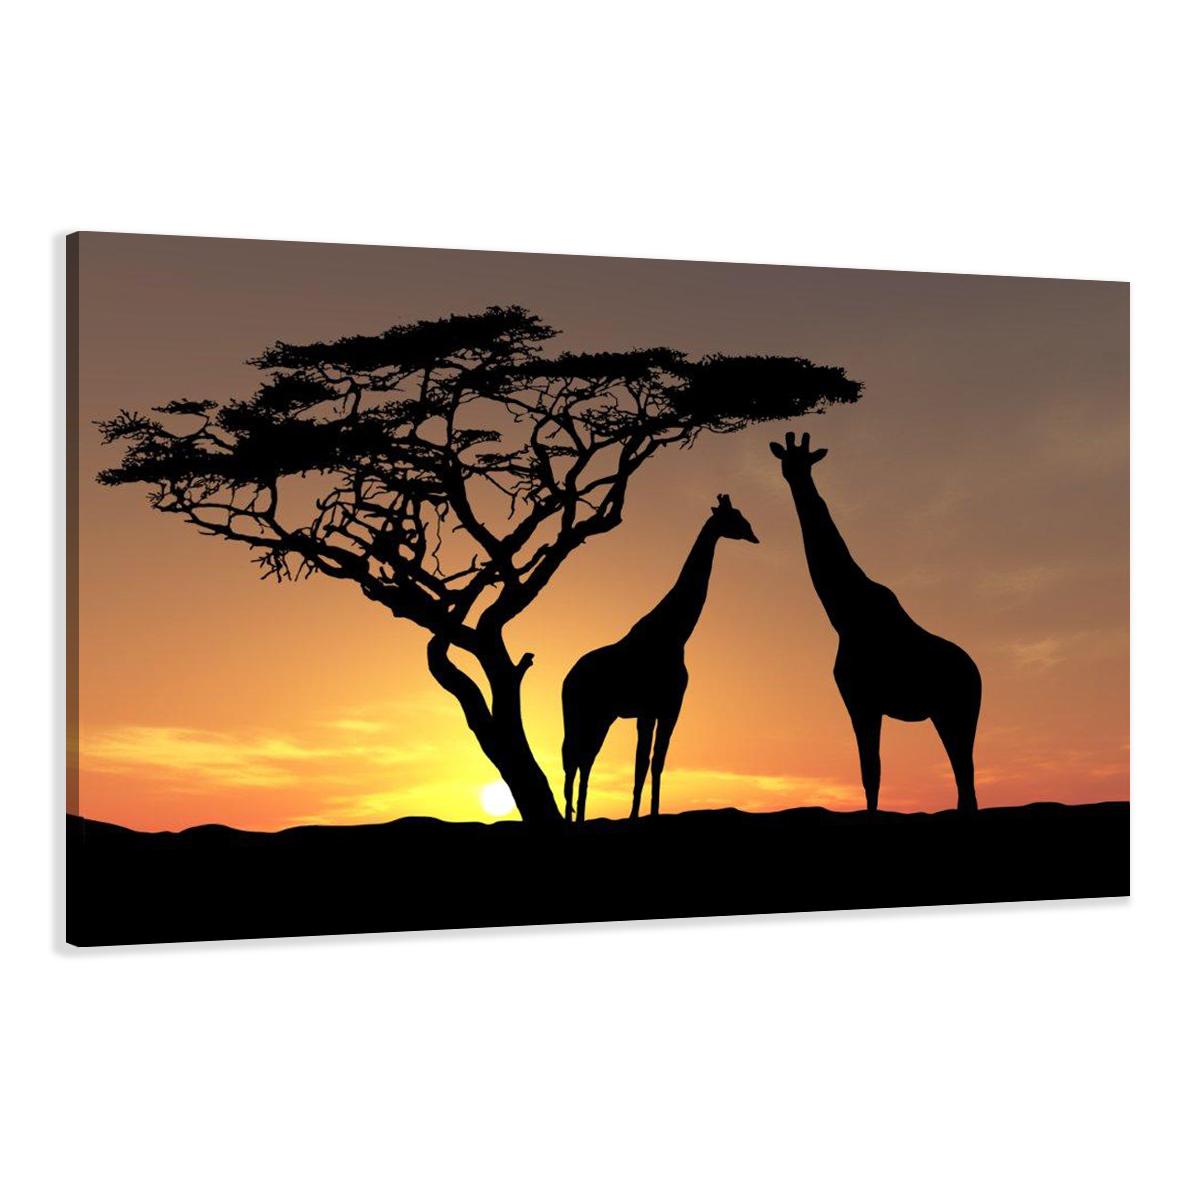 leinwand wandbilder bild afrika giraffen verschiedene. Black Bedroom Furniture Sets. Home Design Ideas